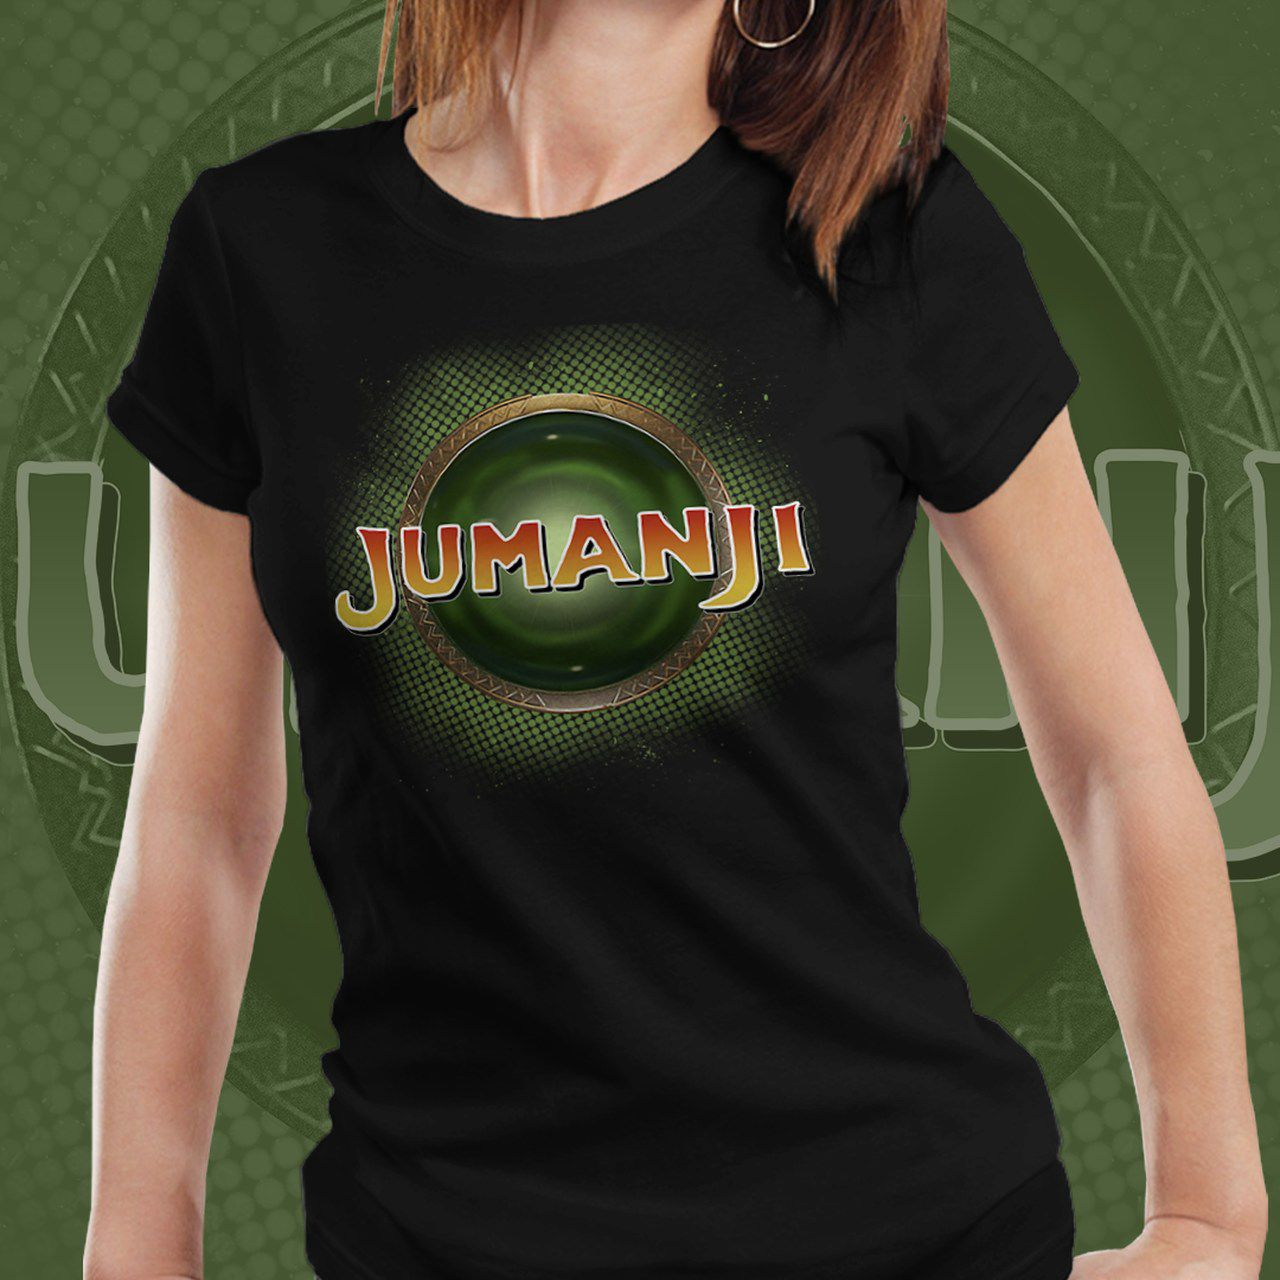 Camiseta Feminina Jumanji